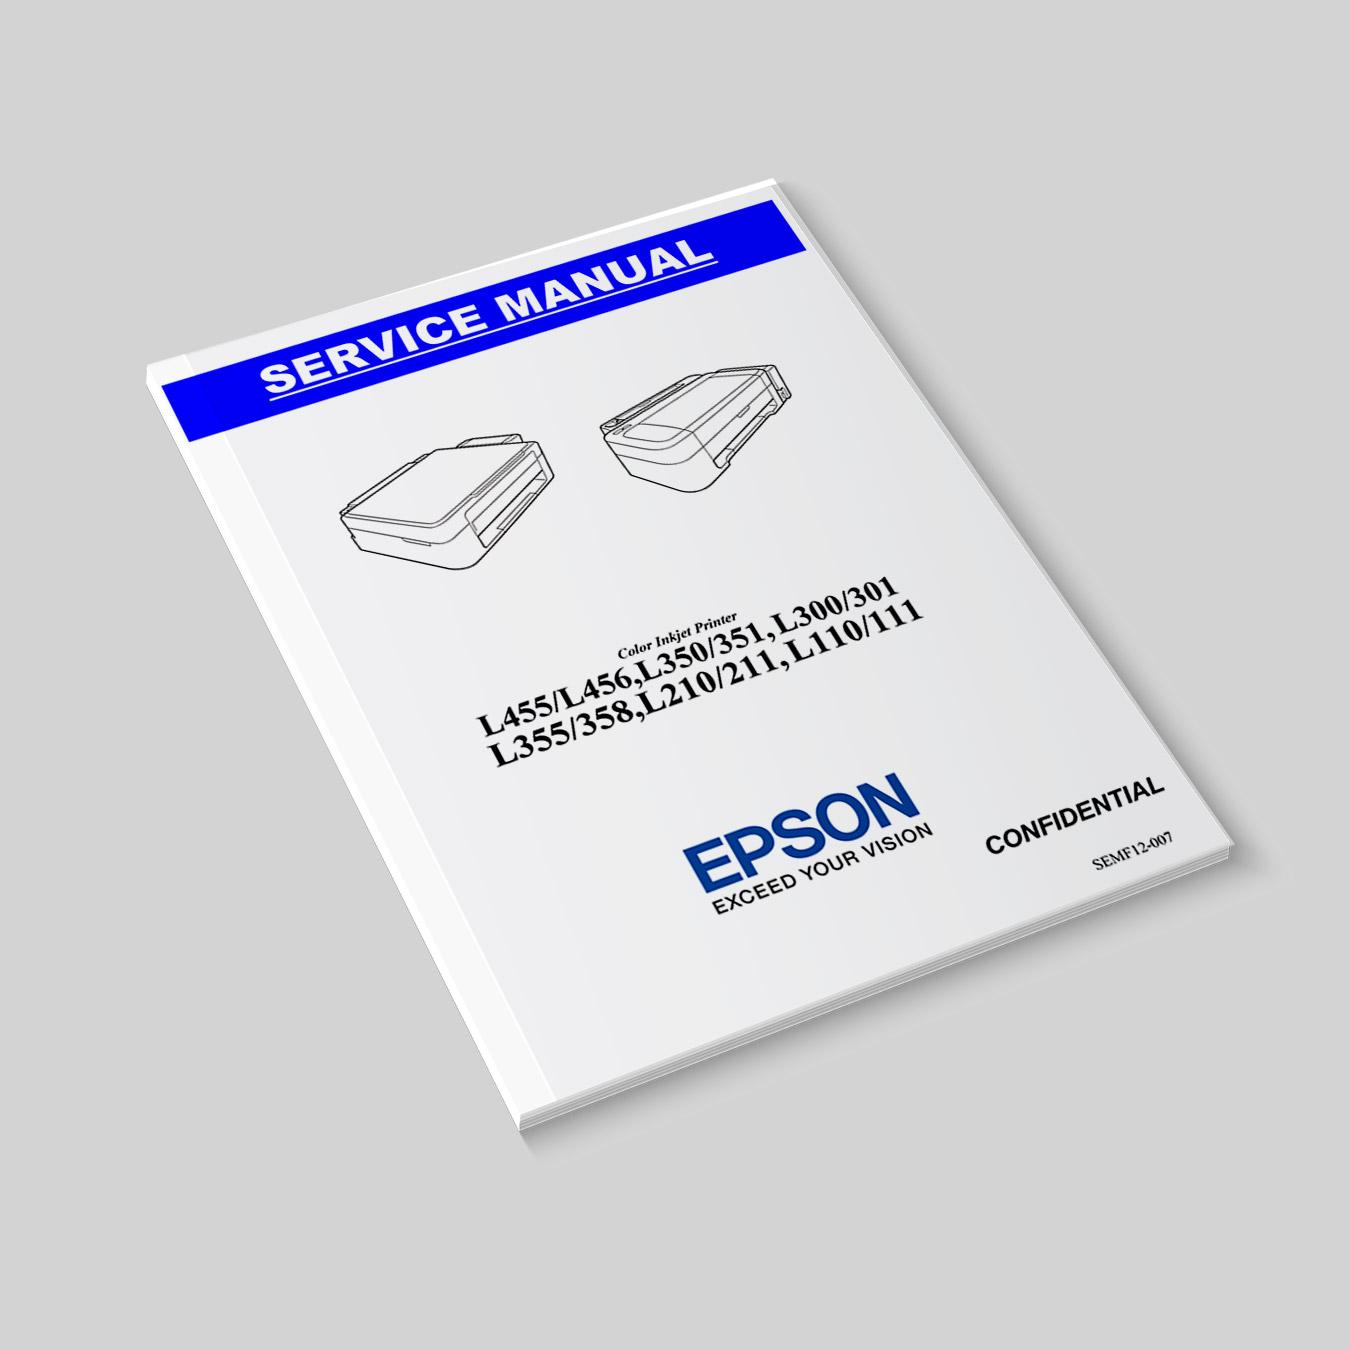 Epson l355 manual.